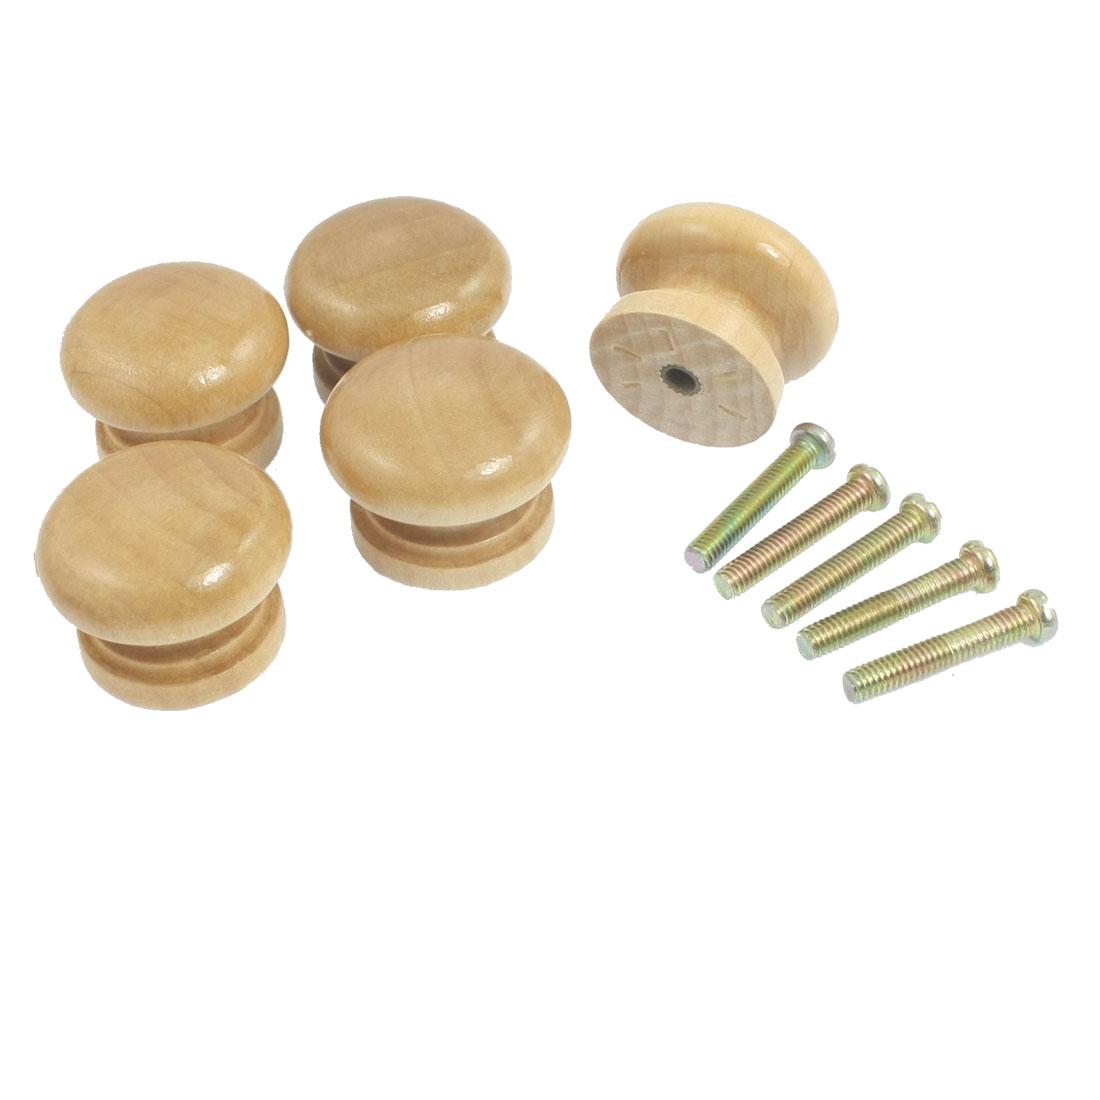 "5 Pcs Cabinet Wood Wooden 1.1"" Dia Round Pull Knob Handles Beige"